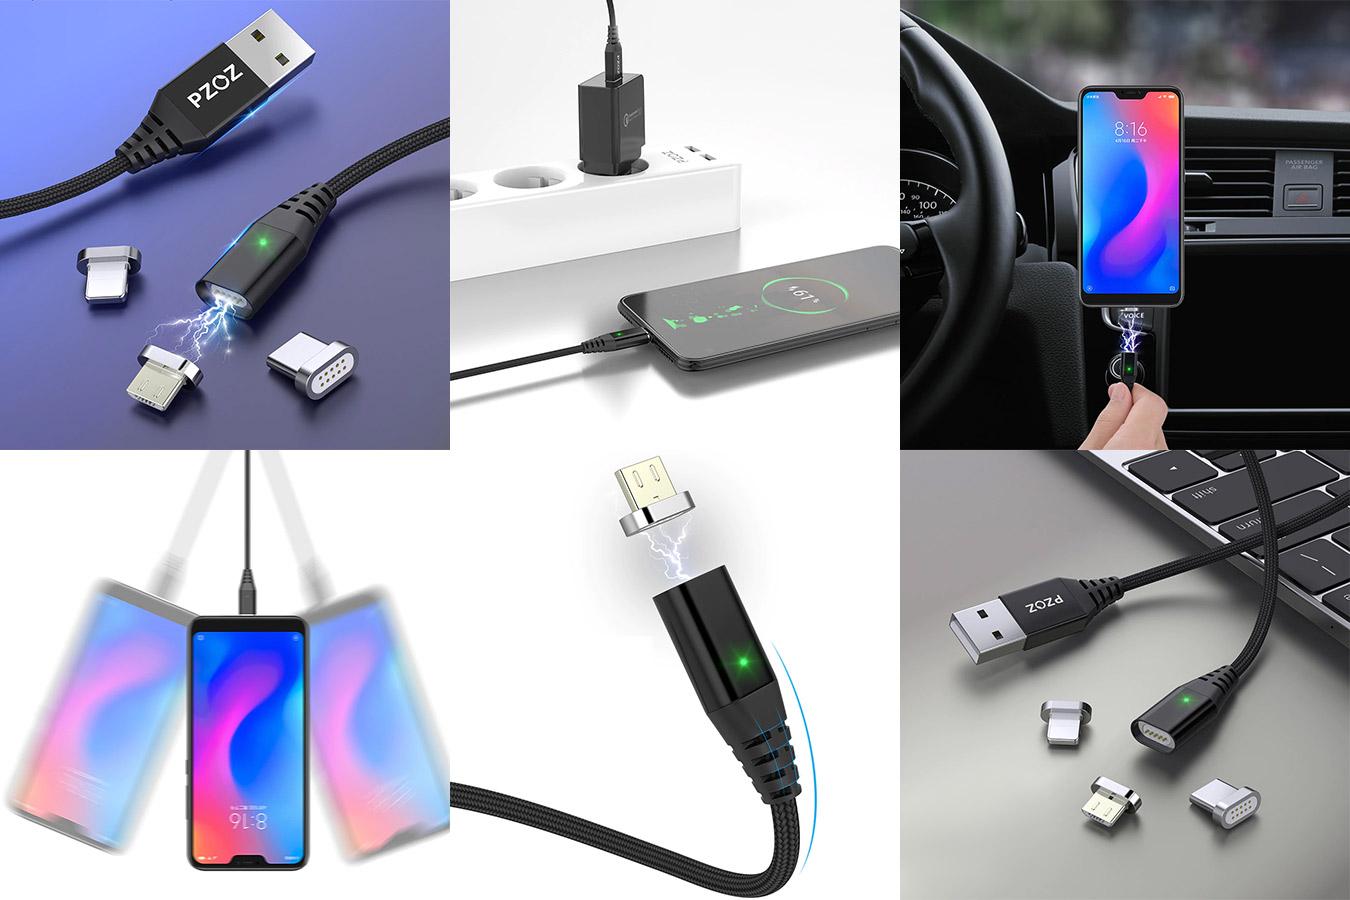 Кабель Micro usb с алиэкспресс